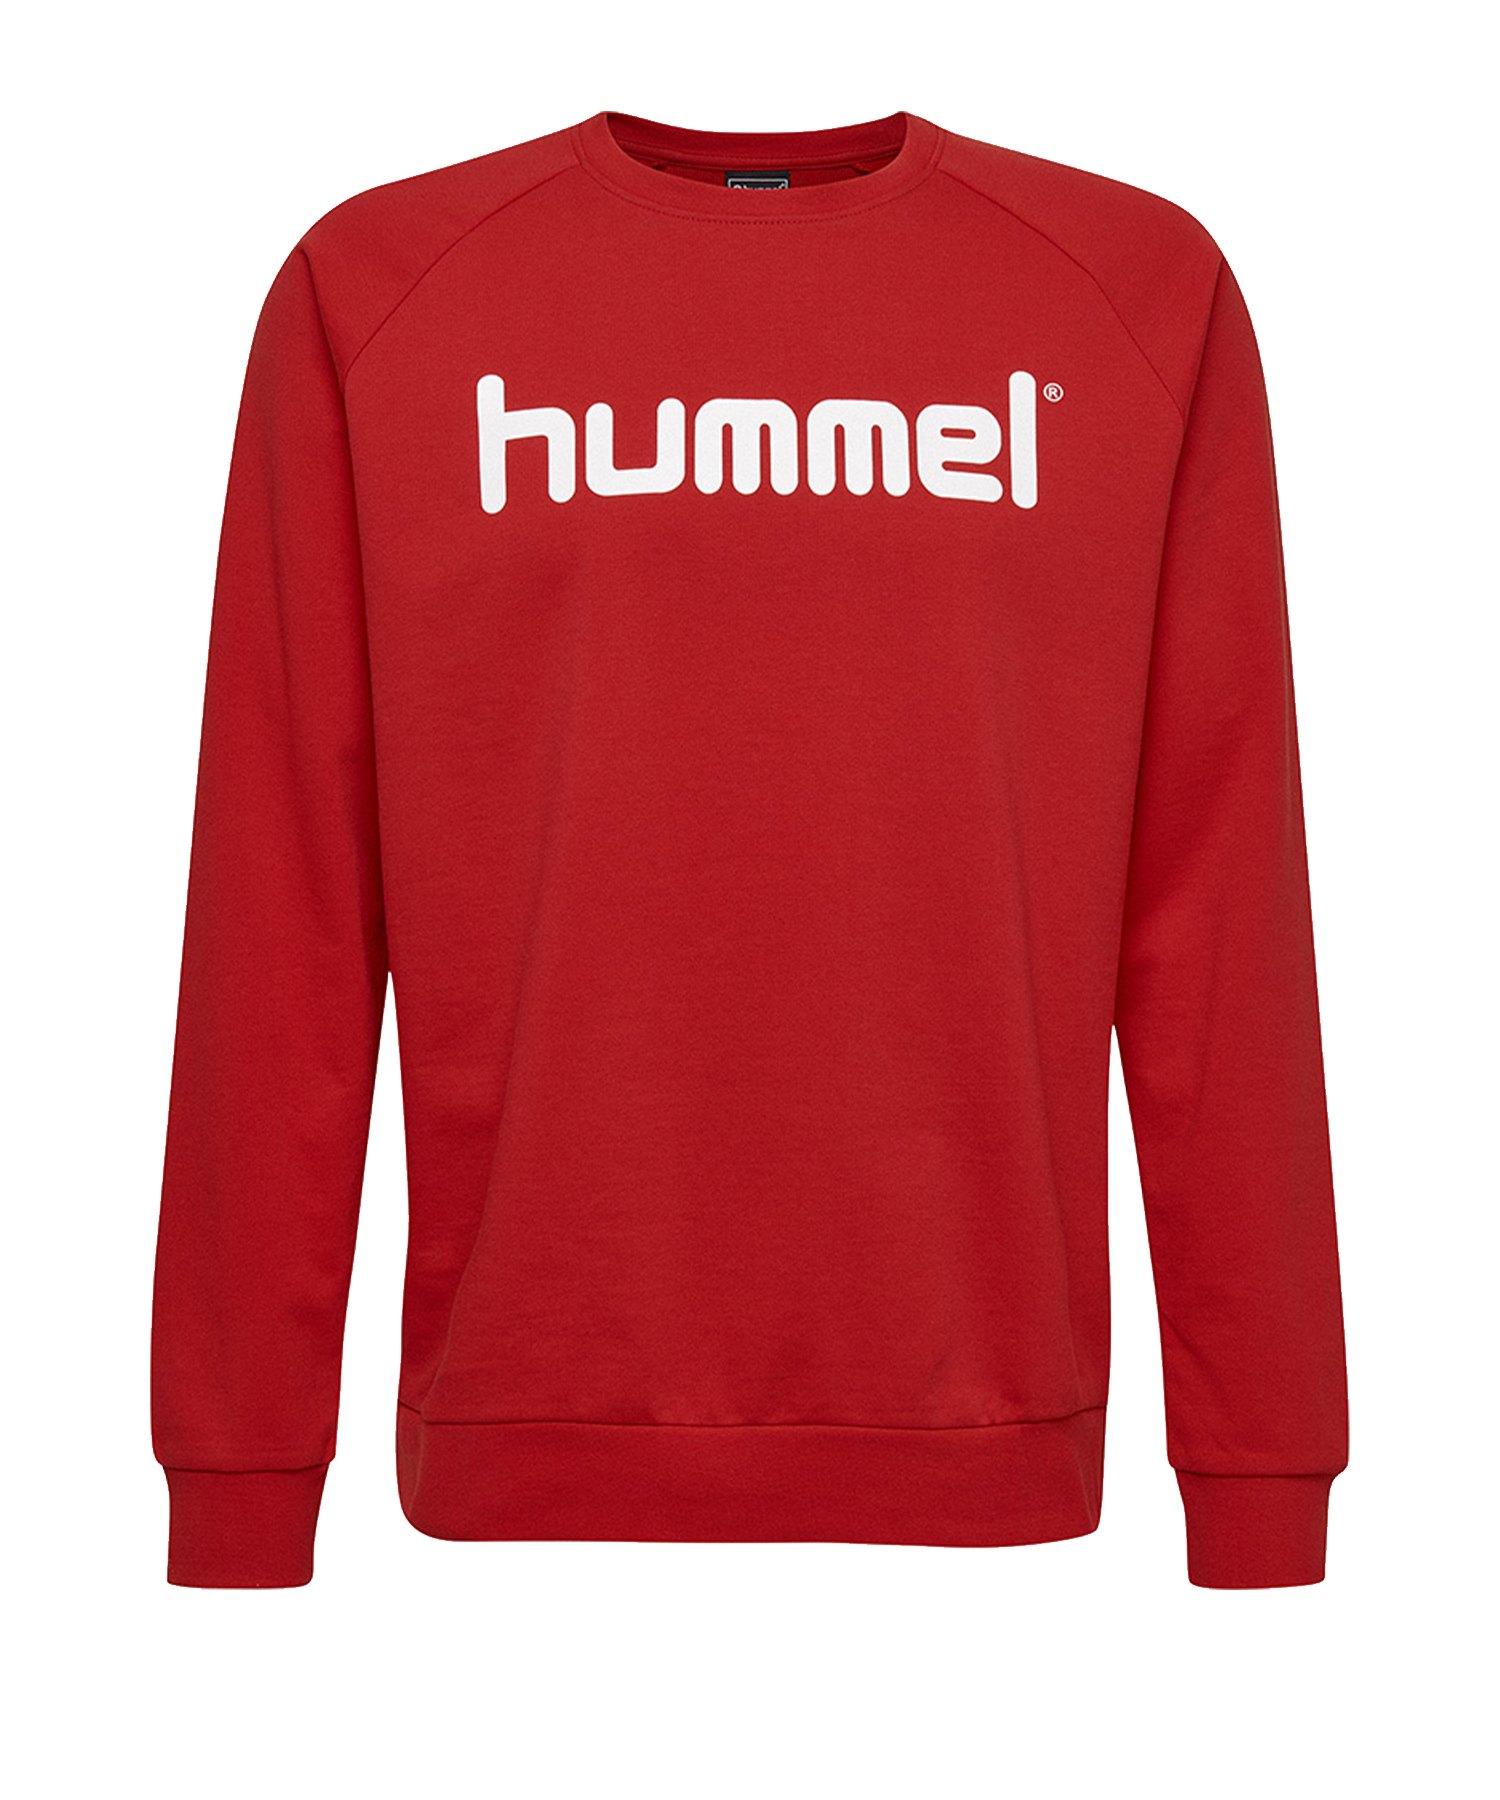 Hummel Cotton Logo Sweatshirt Rot F3062 - Rot